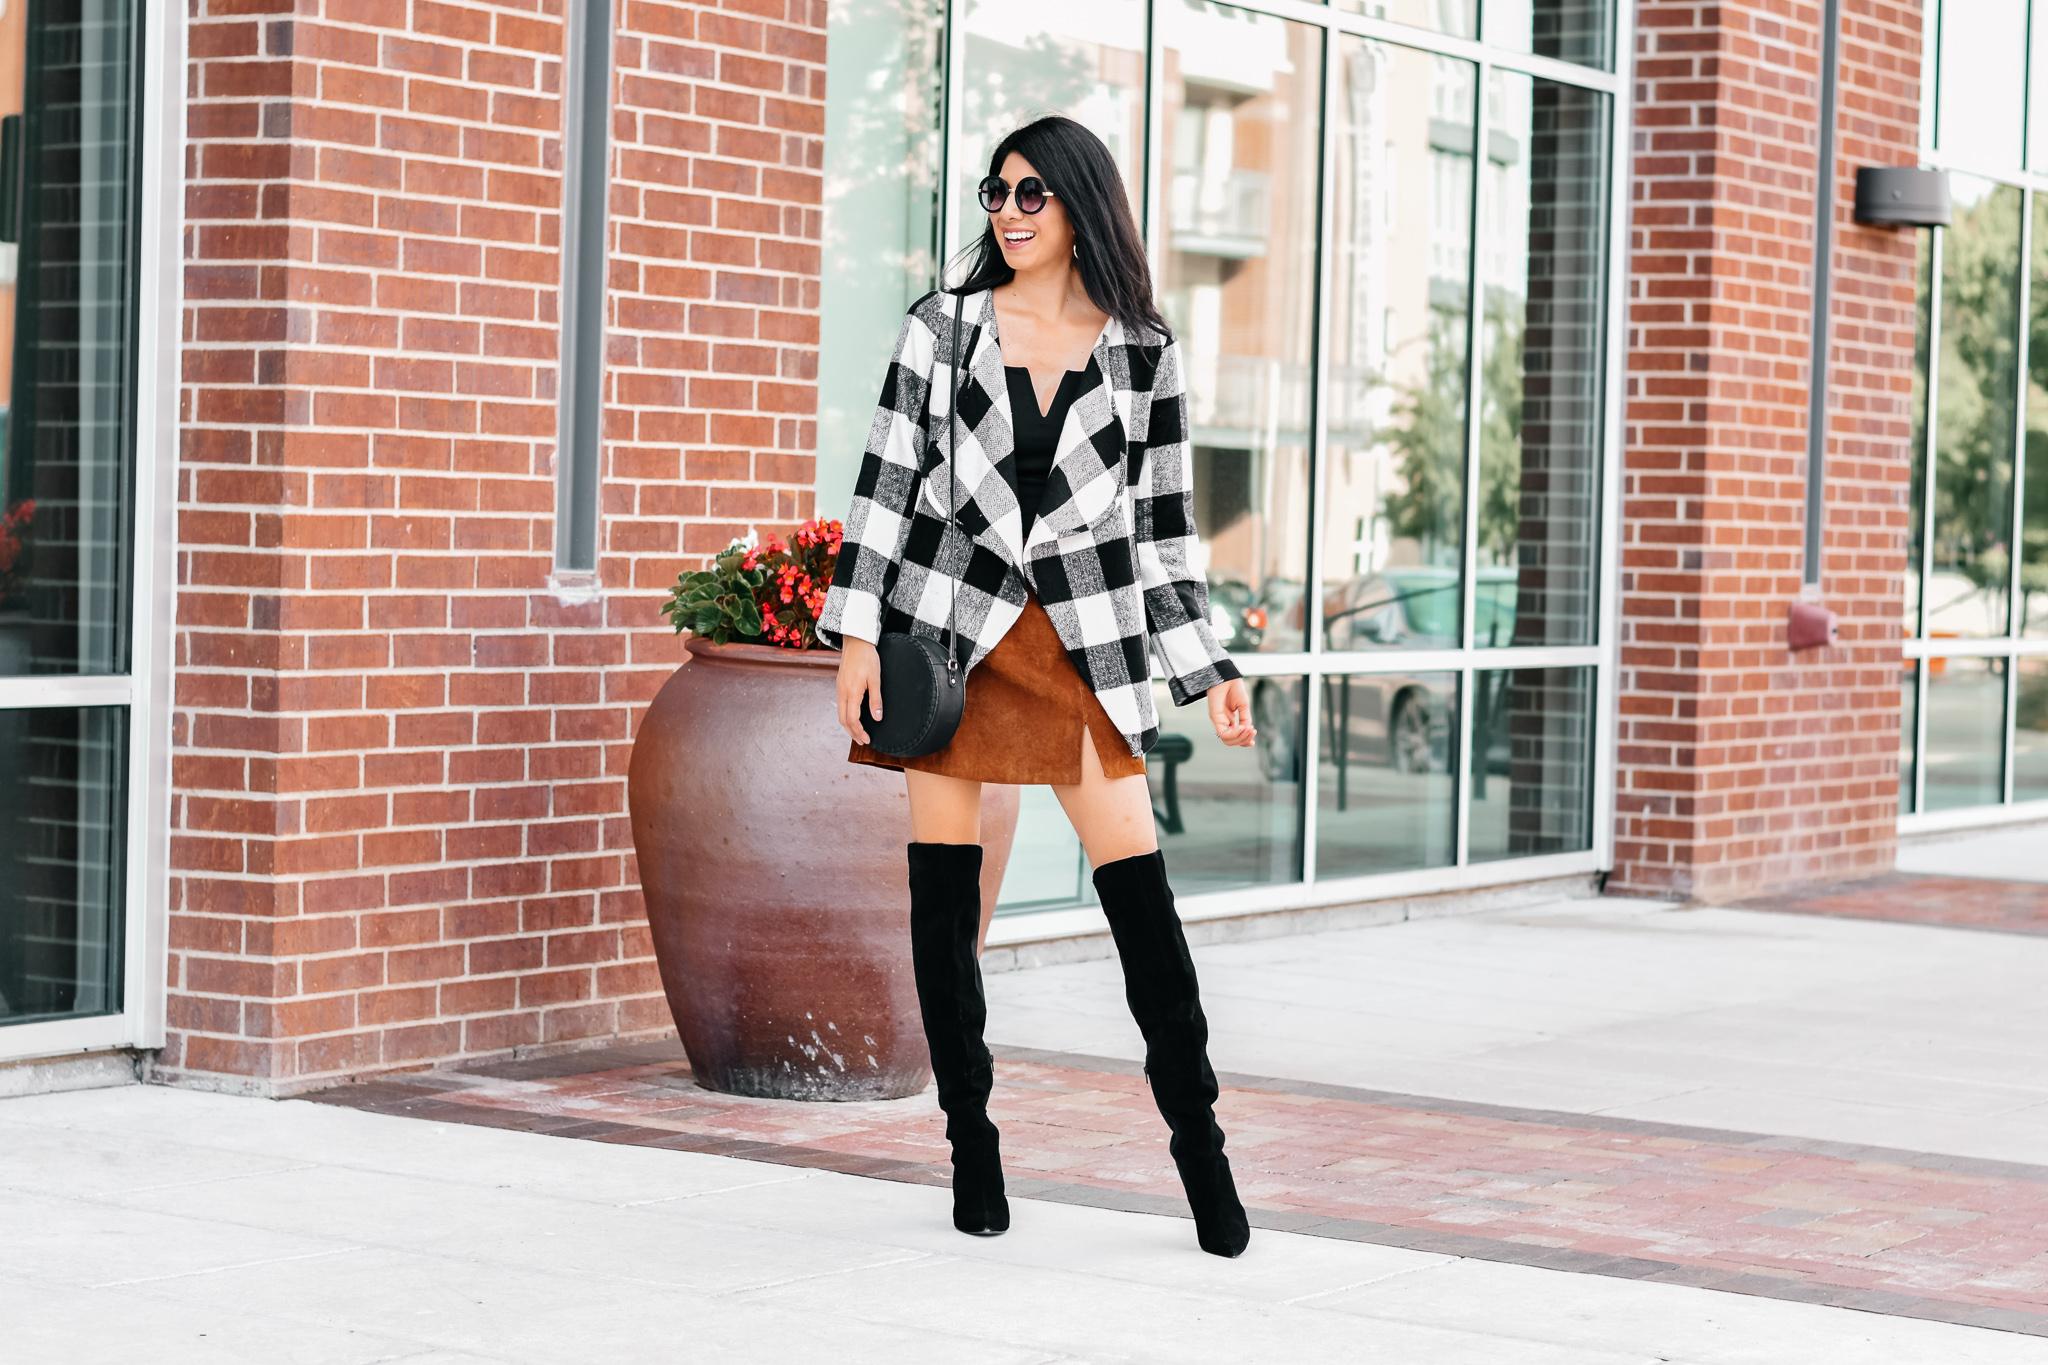 Caridgan/Blazer:  Favlux Buffalo Check Plaid Cardigan Sweater